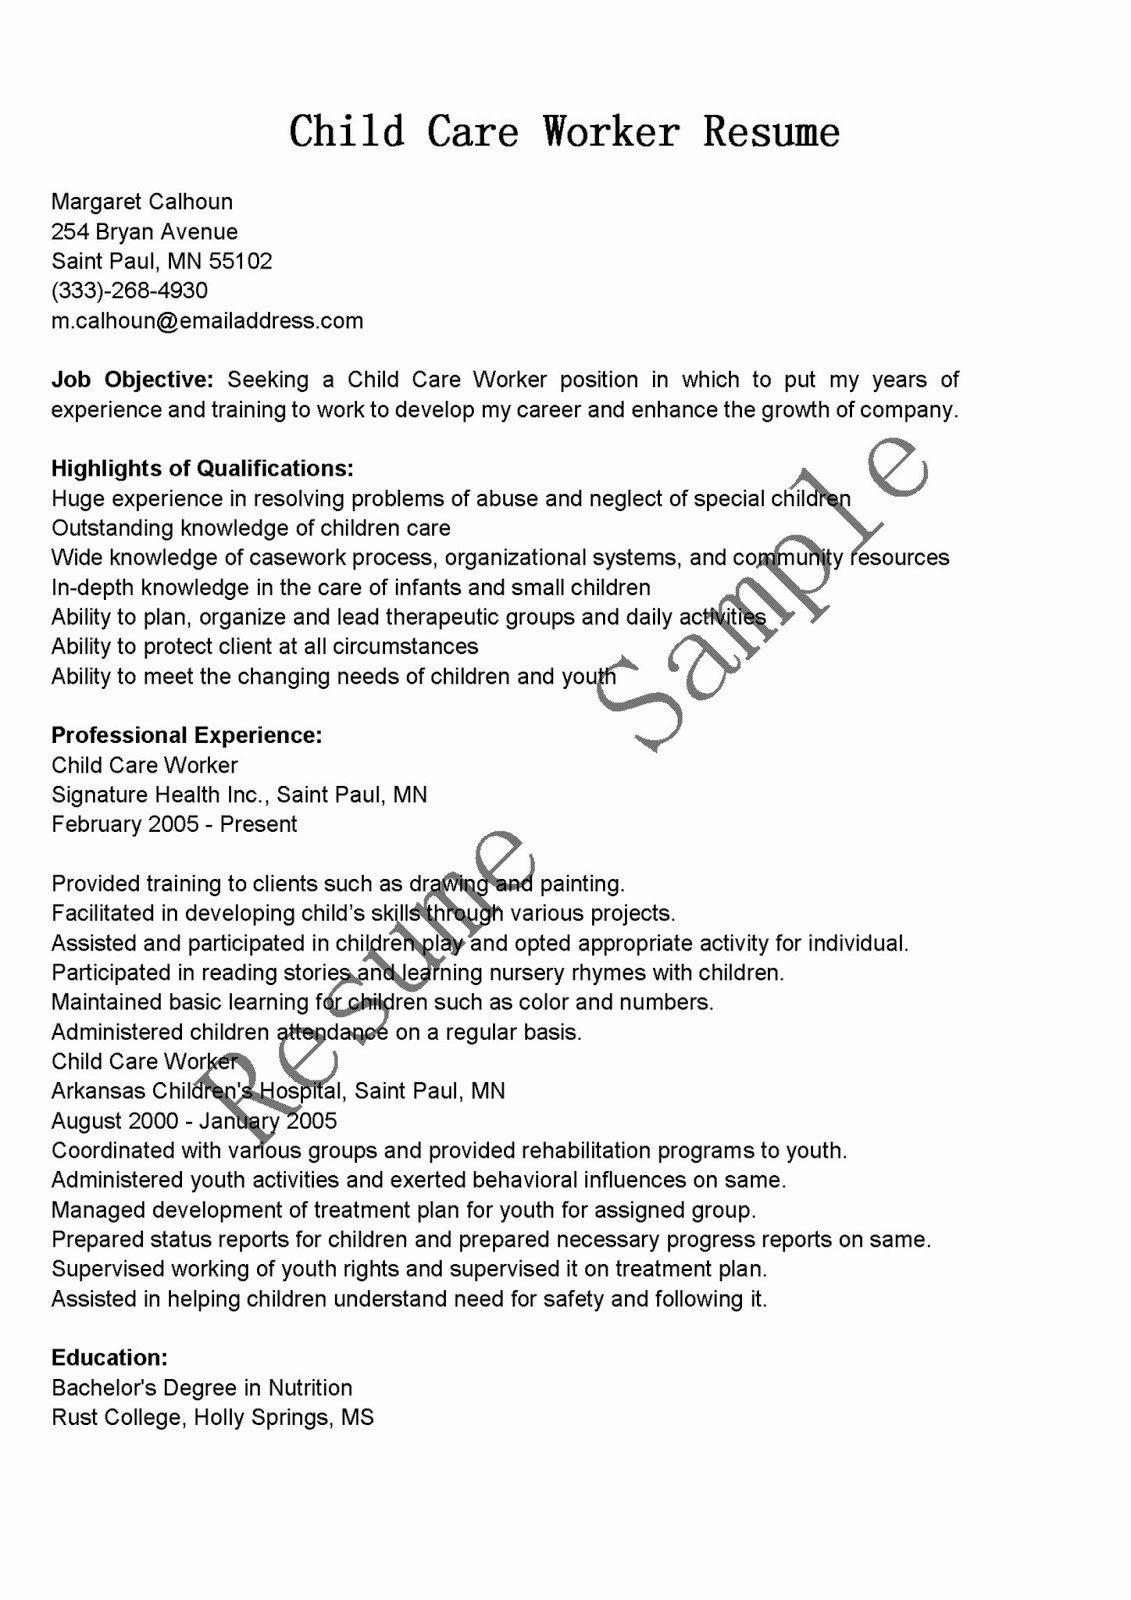 Child Care Worker Resume Fresh Resume Samples Child Care Worker Resume Sample Child Care Worker Job Resume Examples Job Resume Samples